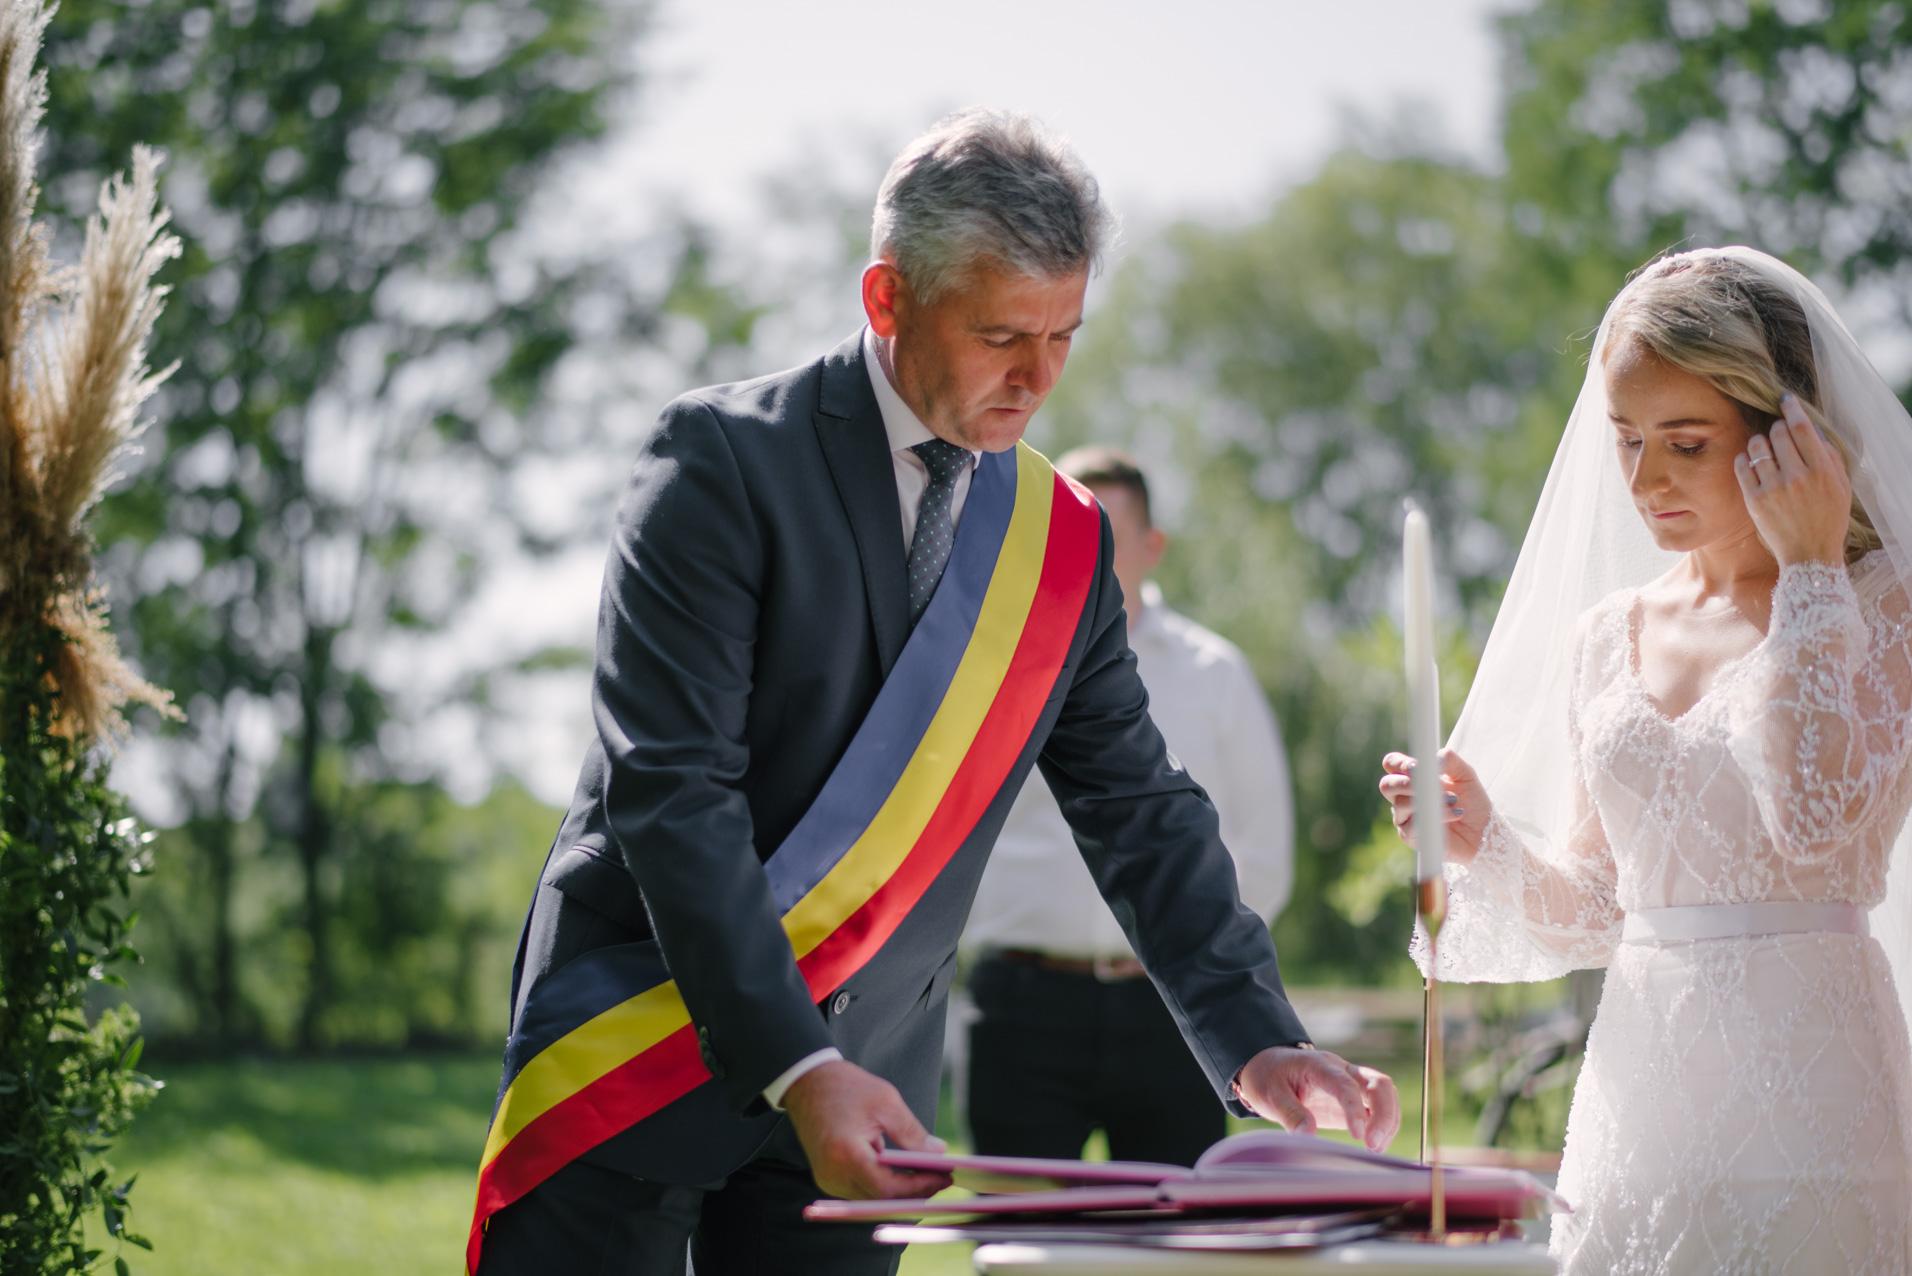 Outdoor wedding ceremony Bacau Roamina